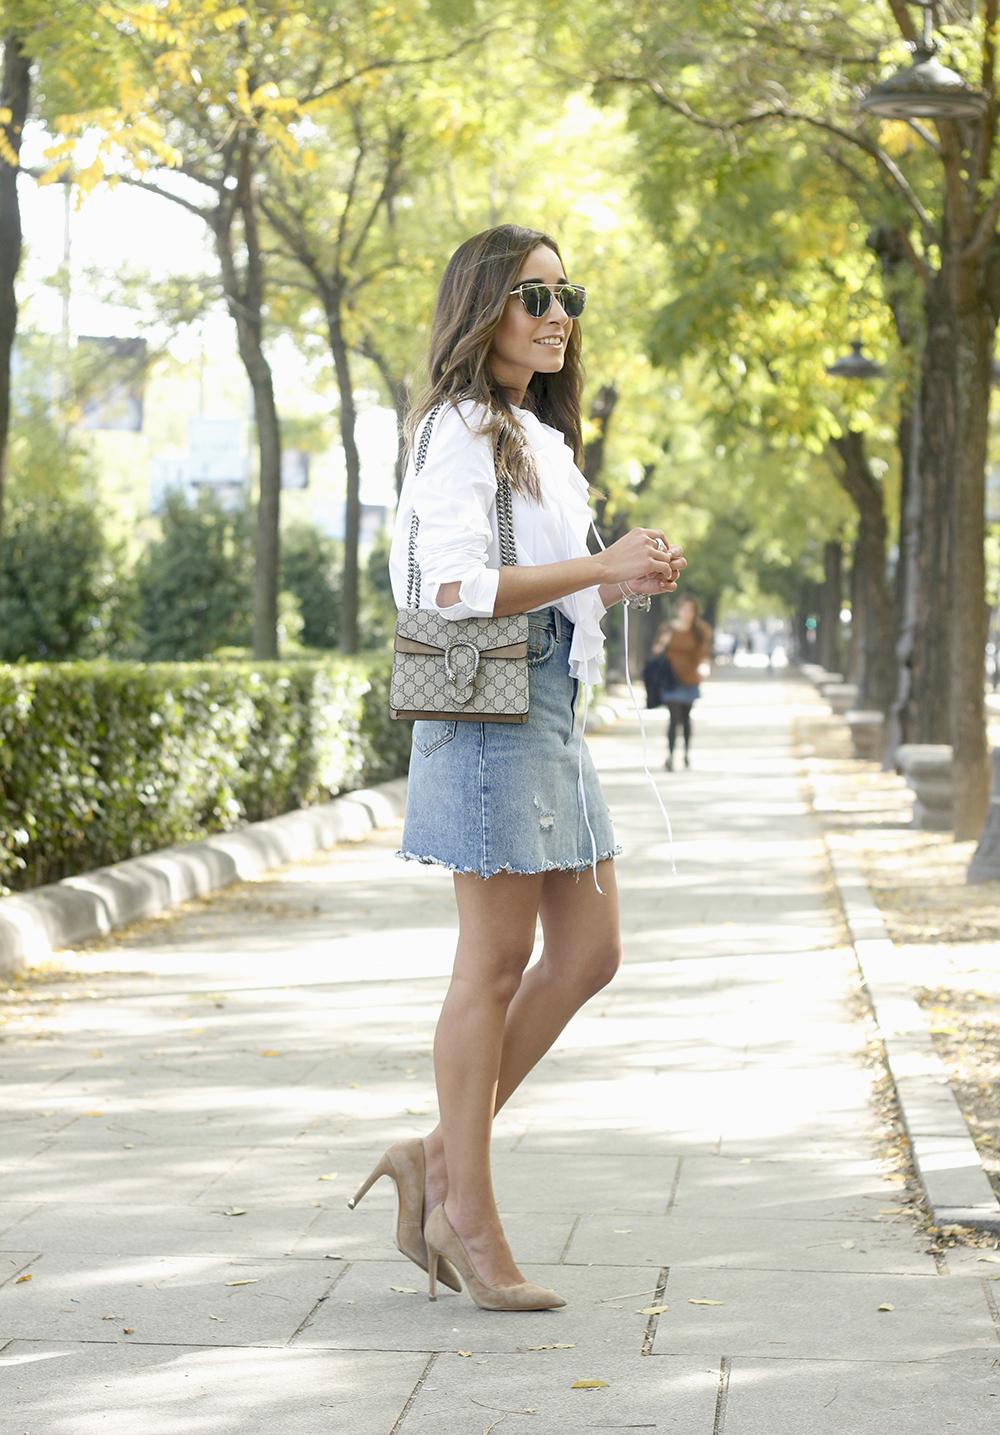 ruffled shirt uterqüe denim shirt sunnies heels gucci bag outfit fashion style02